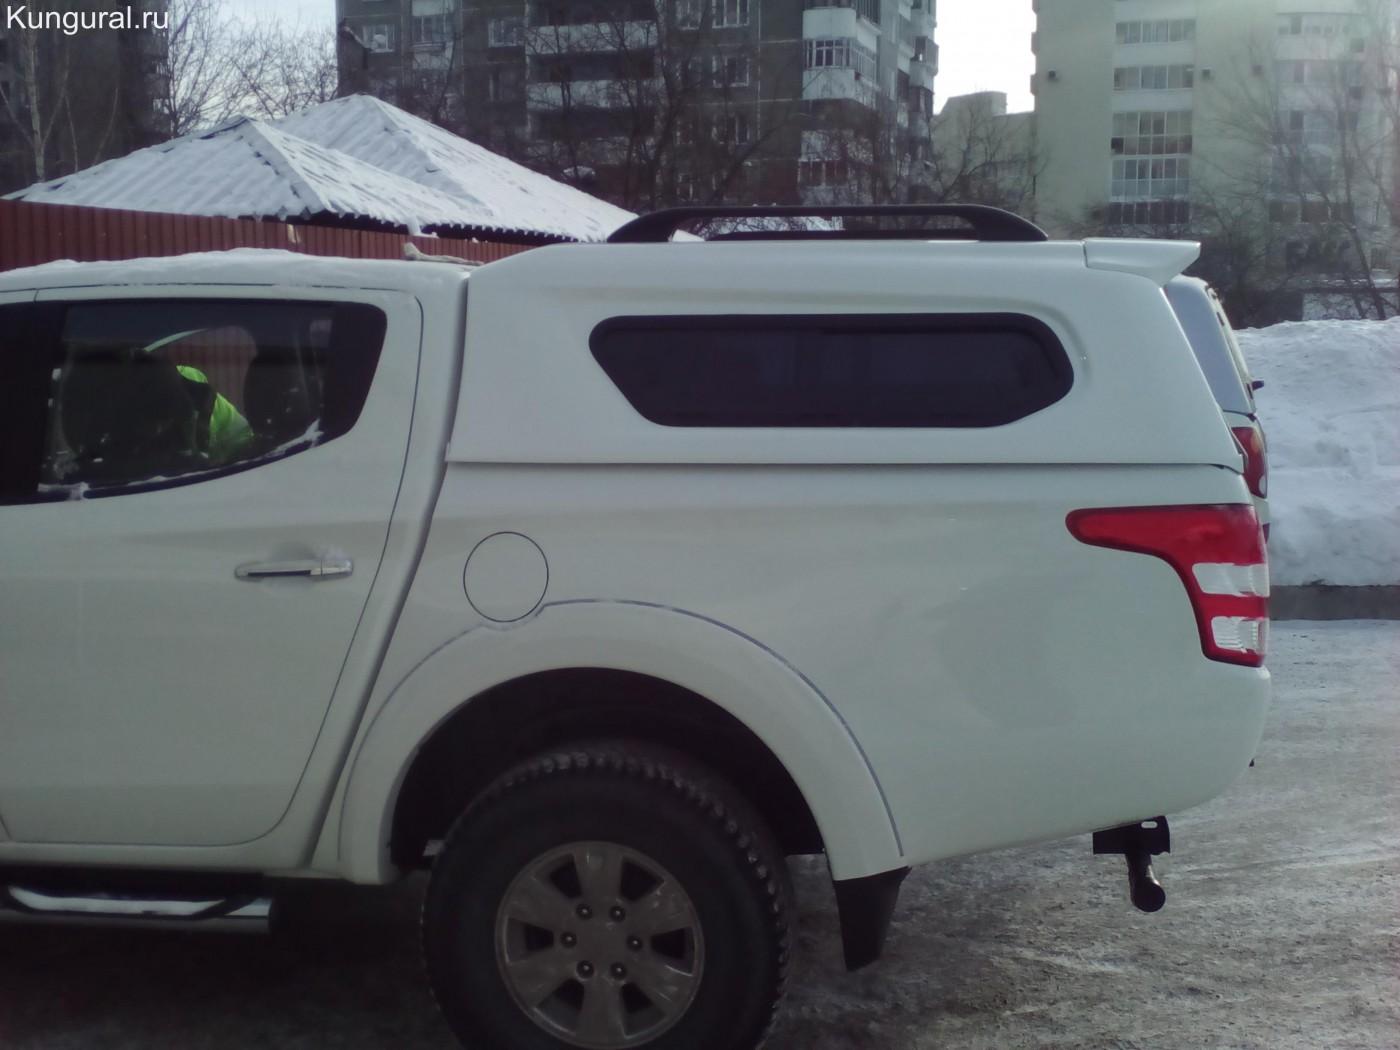 "Кунг Mitsubishi L200 оригинал NEW 2015 - Интернет-магазин кунгов ""Кунг-Урал"", Екатеринбург"